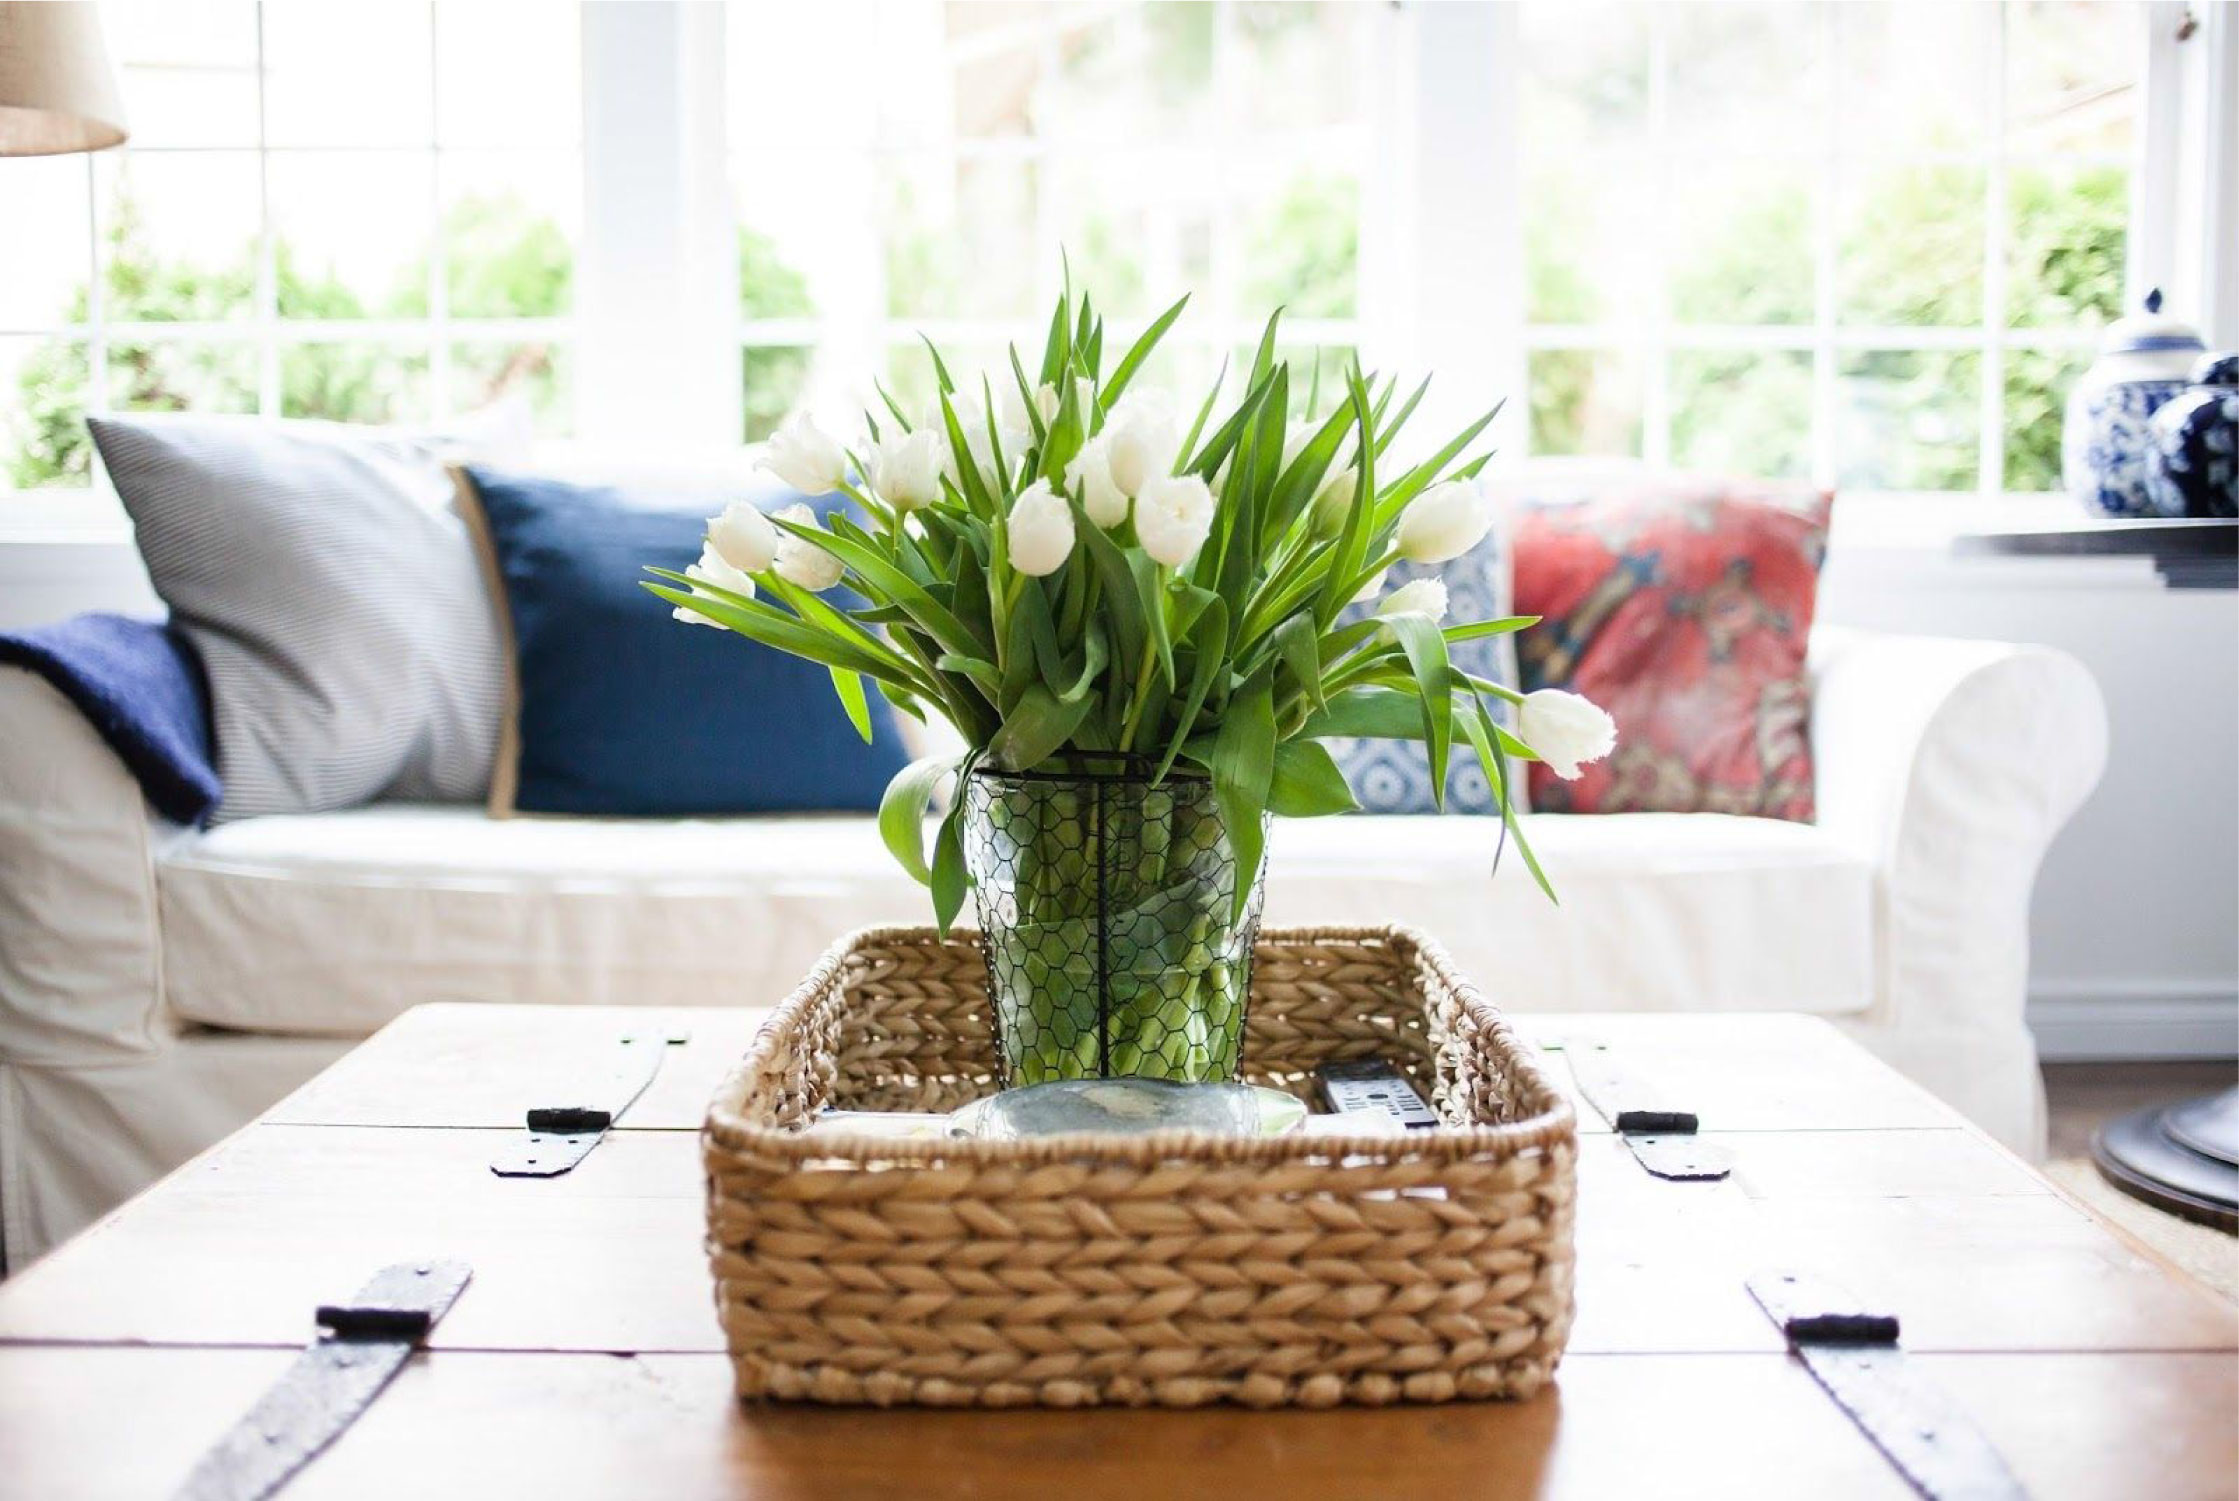 Stacey_Steward_interior_design_living_room.jpg